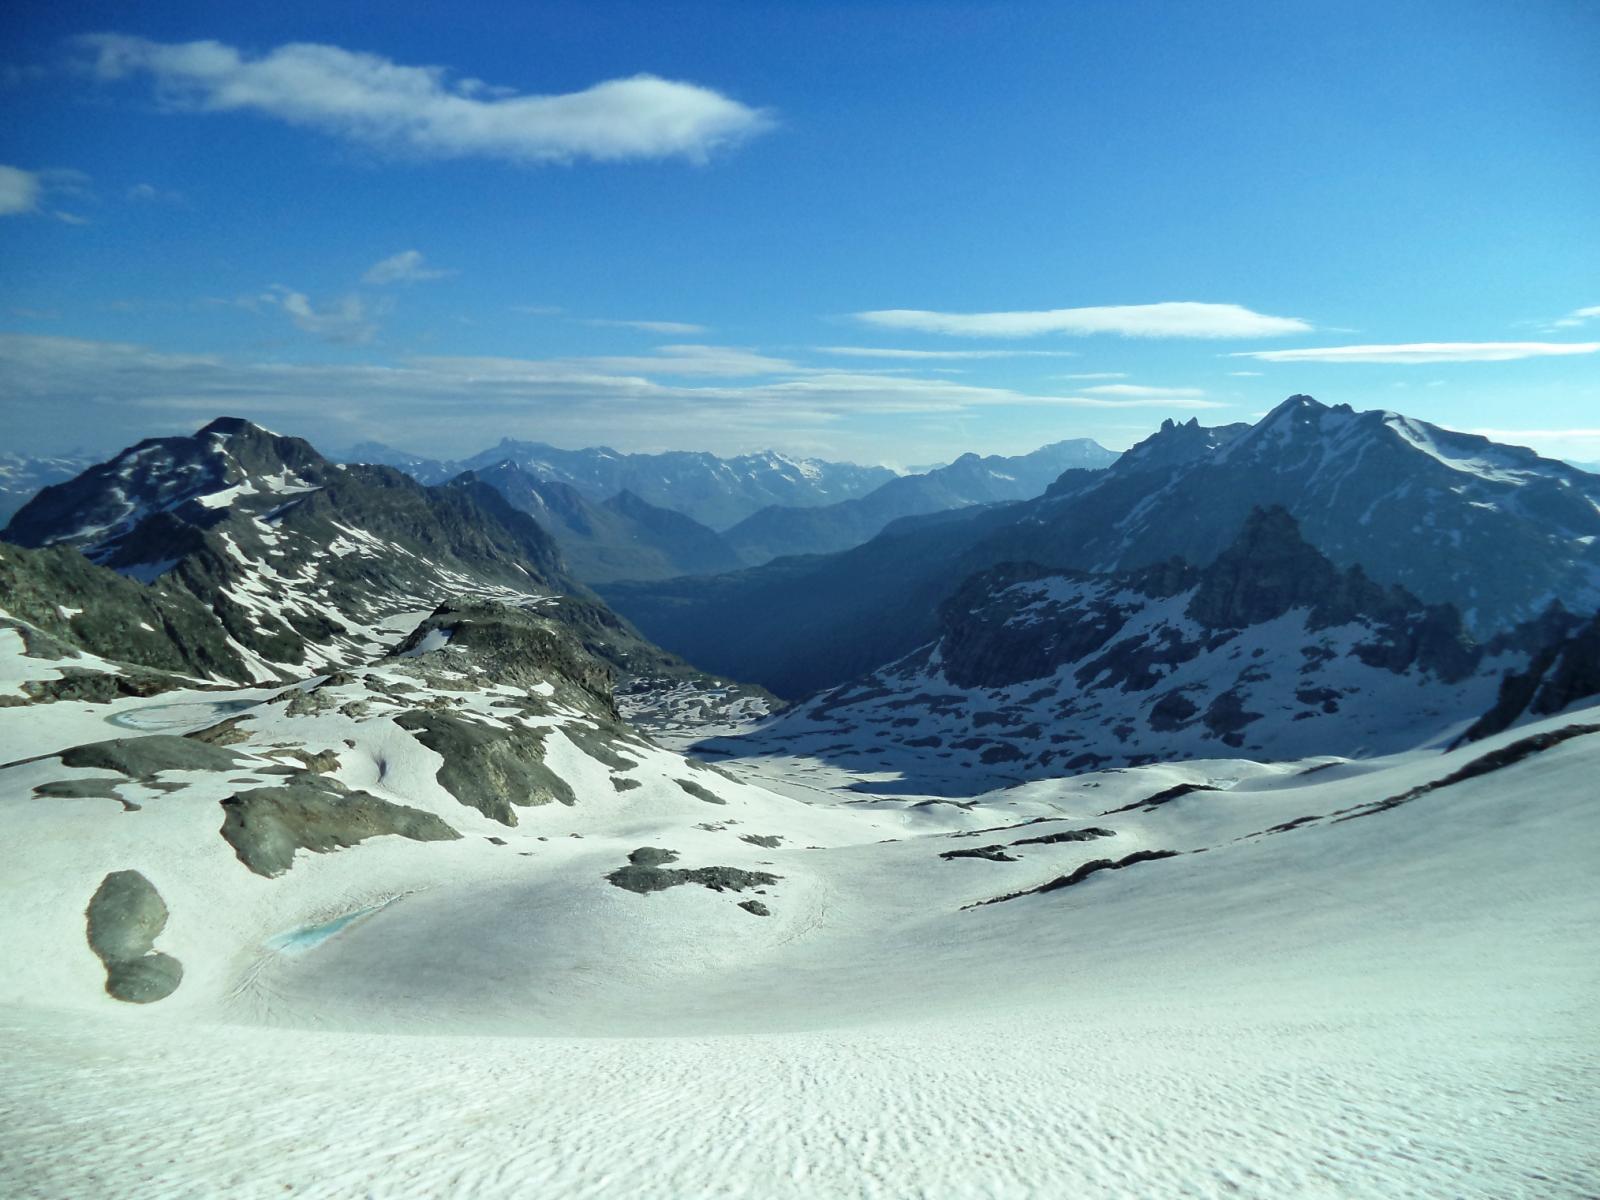 ambiente ghiacciaio del sommeiller